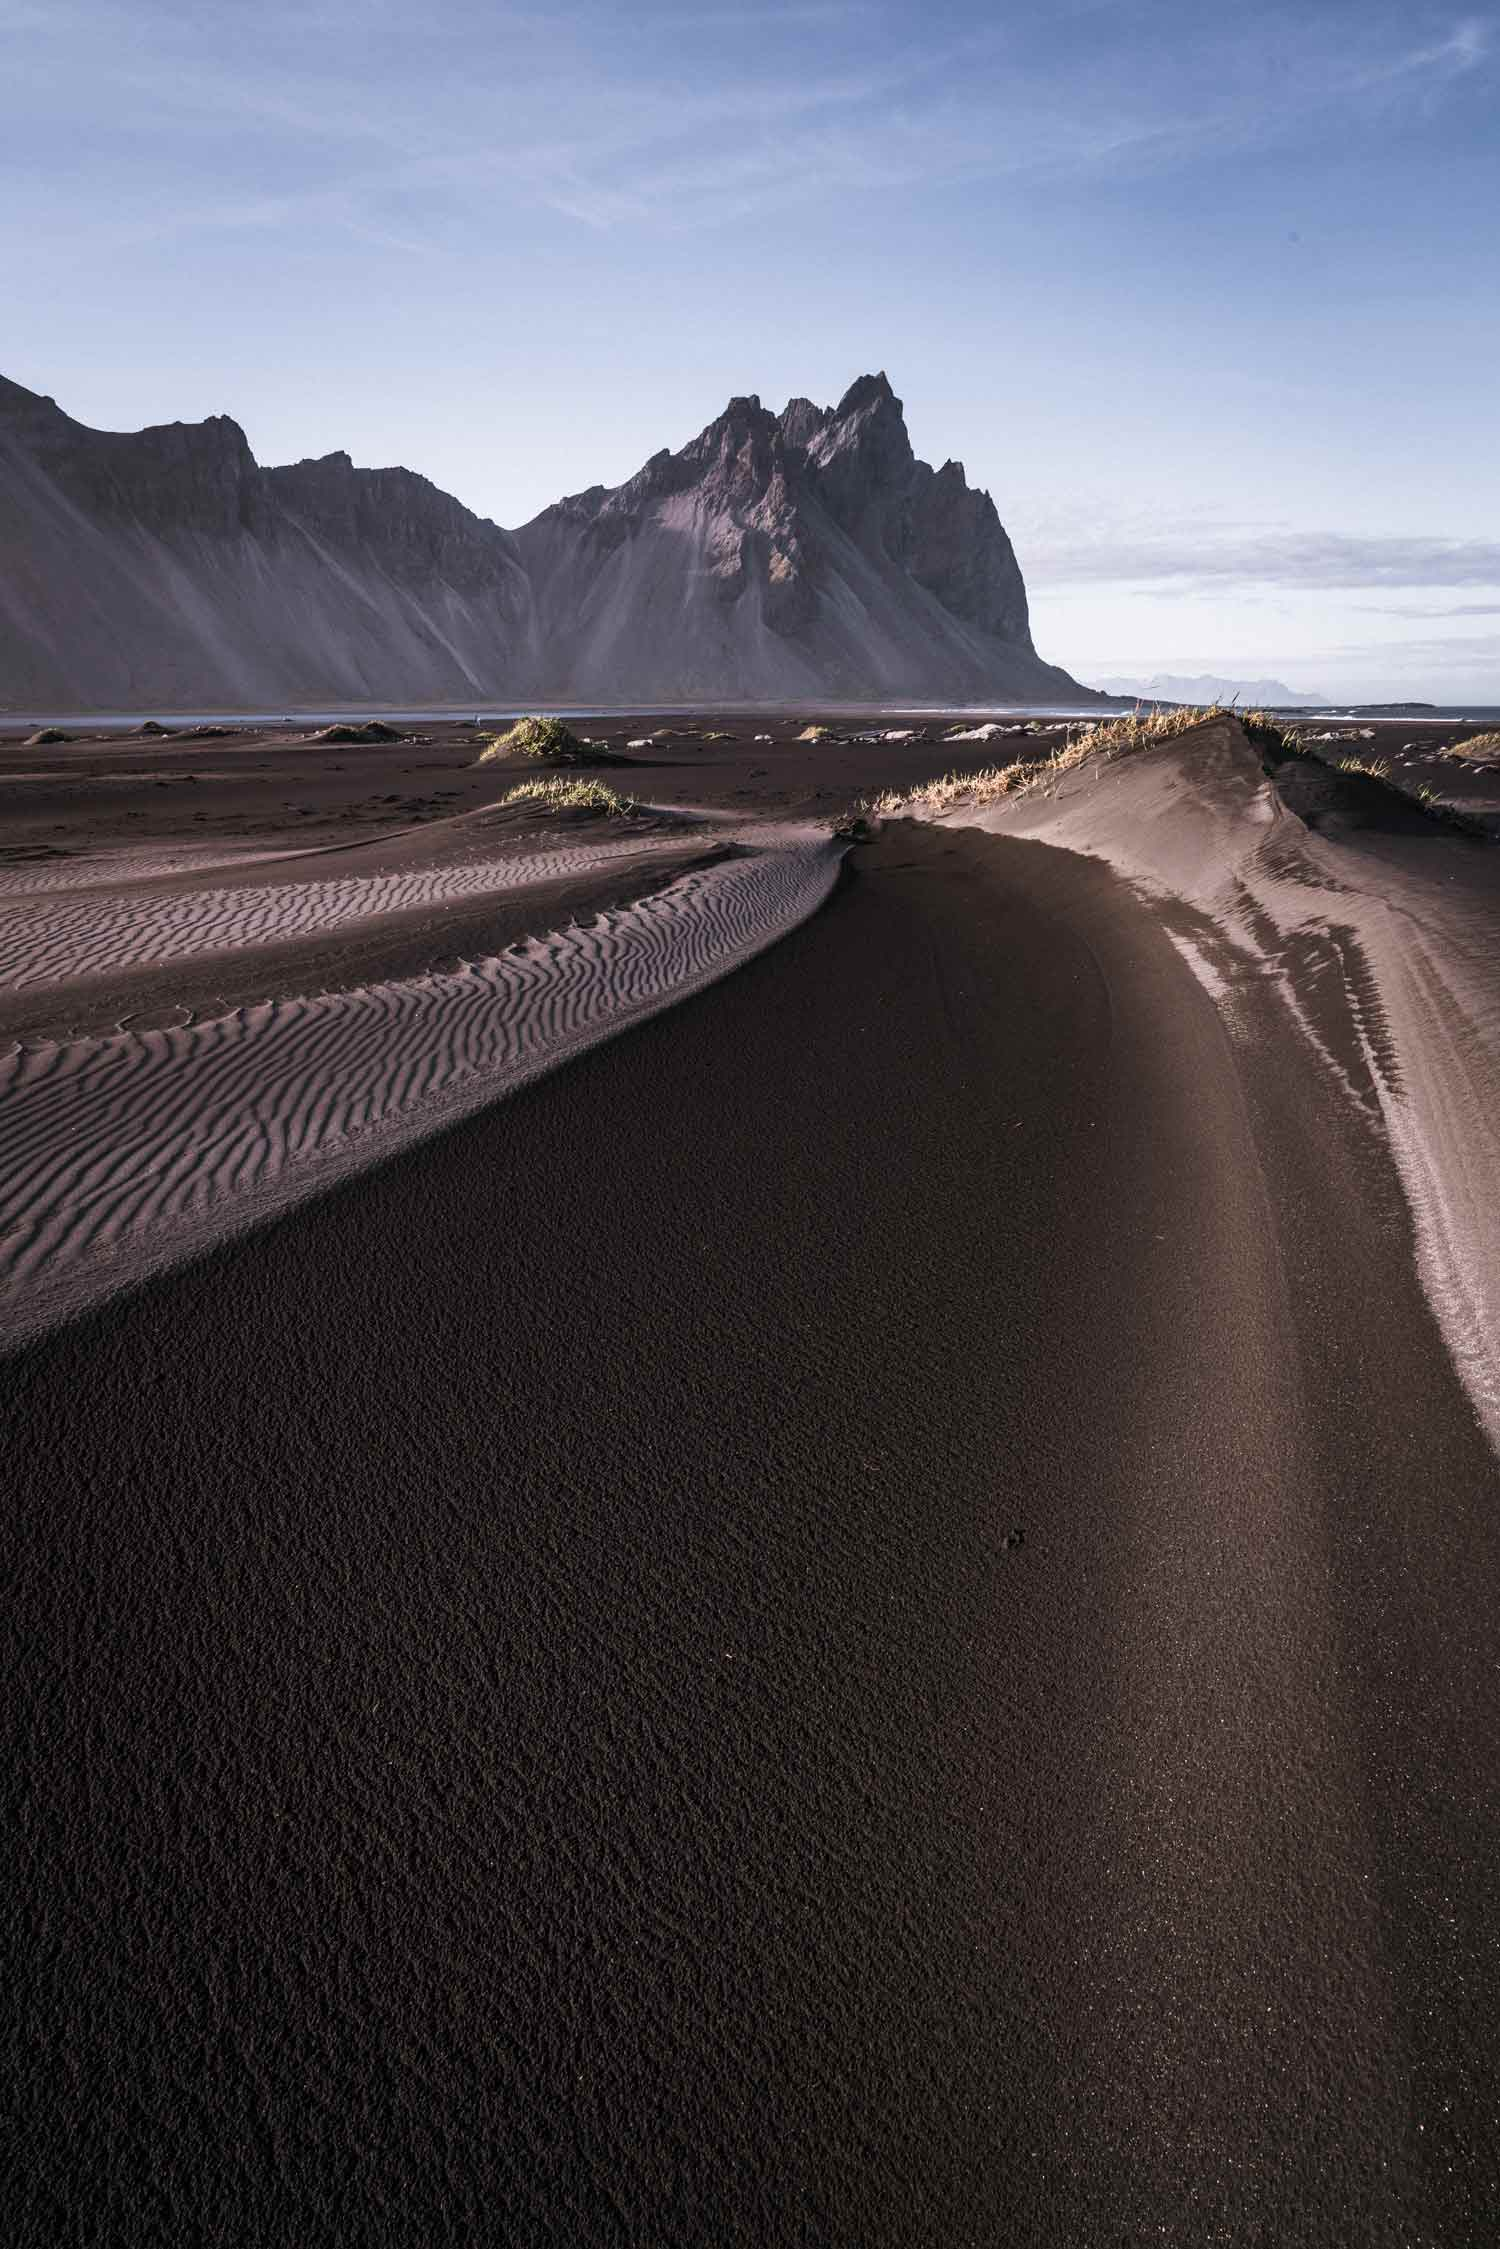 Landscape-Photography-Focus-Presetpro.com